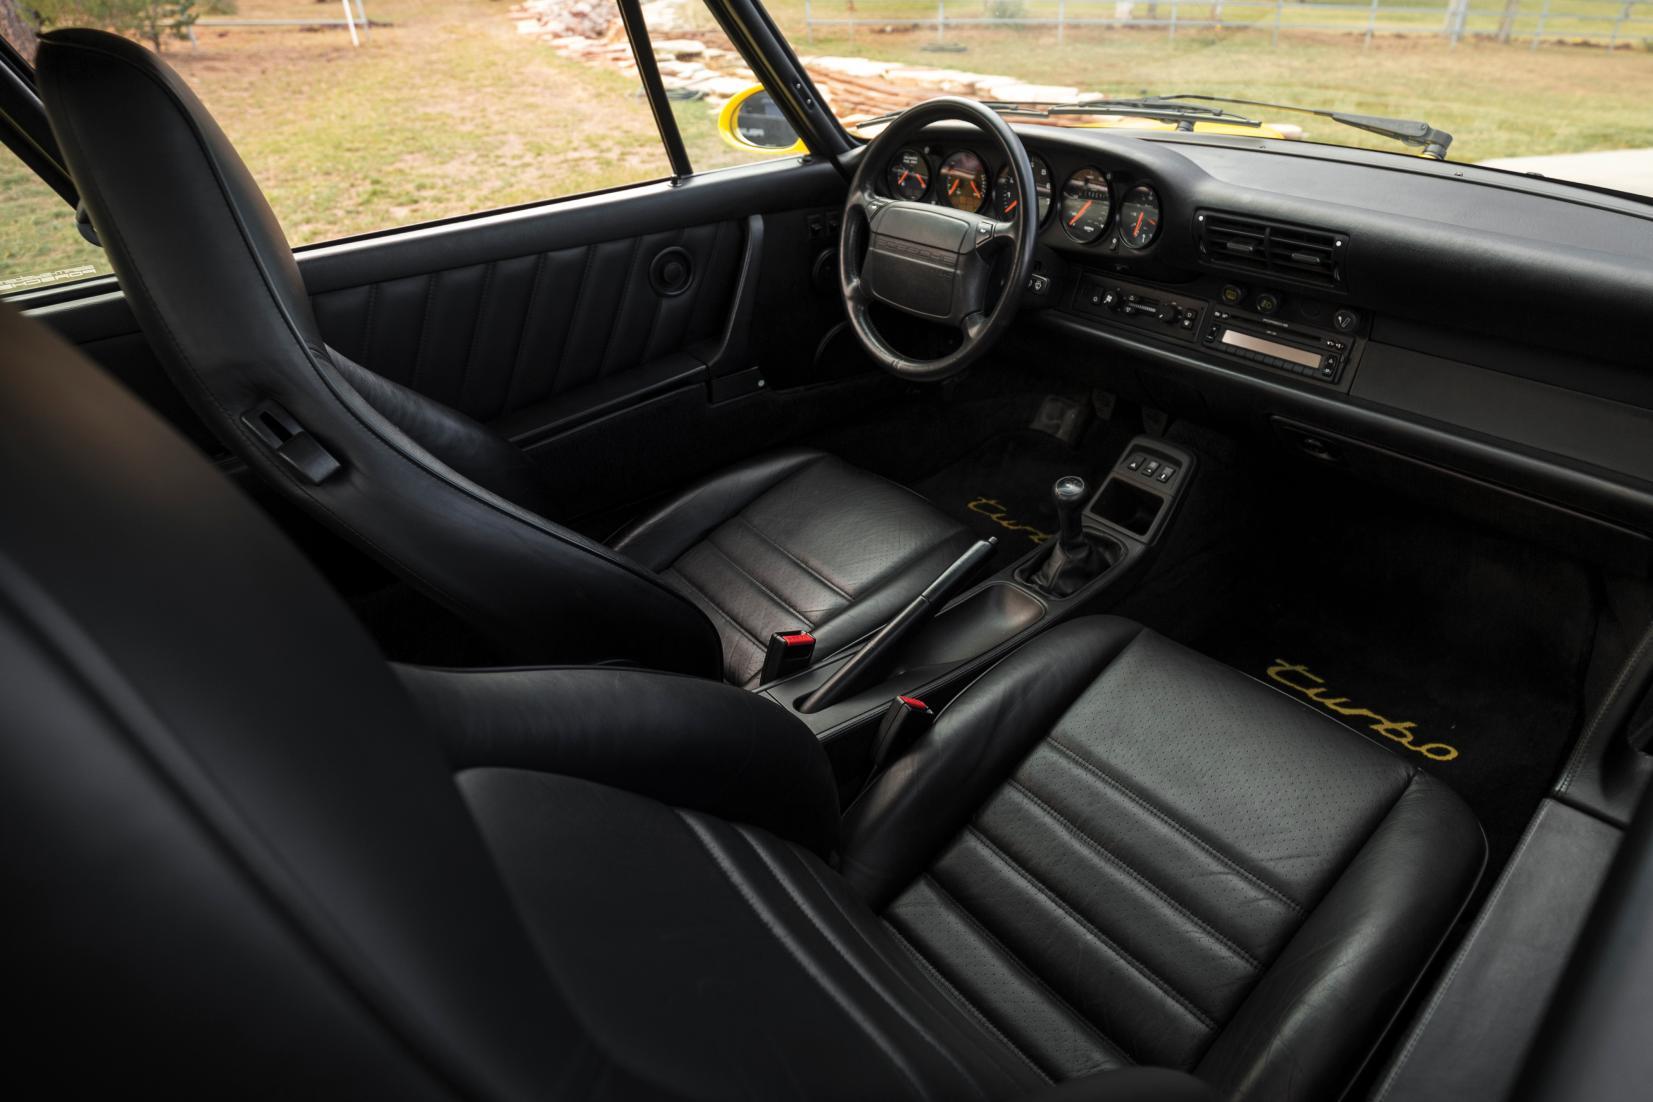 Interieur Porsche 911 Turbo 964 1991